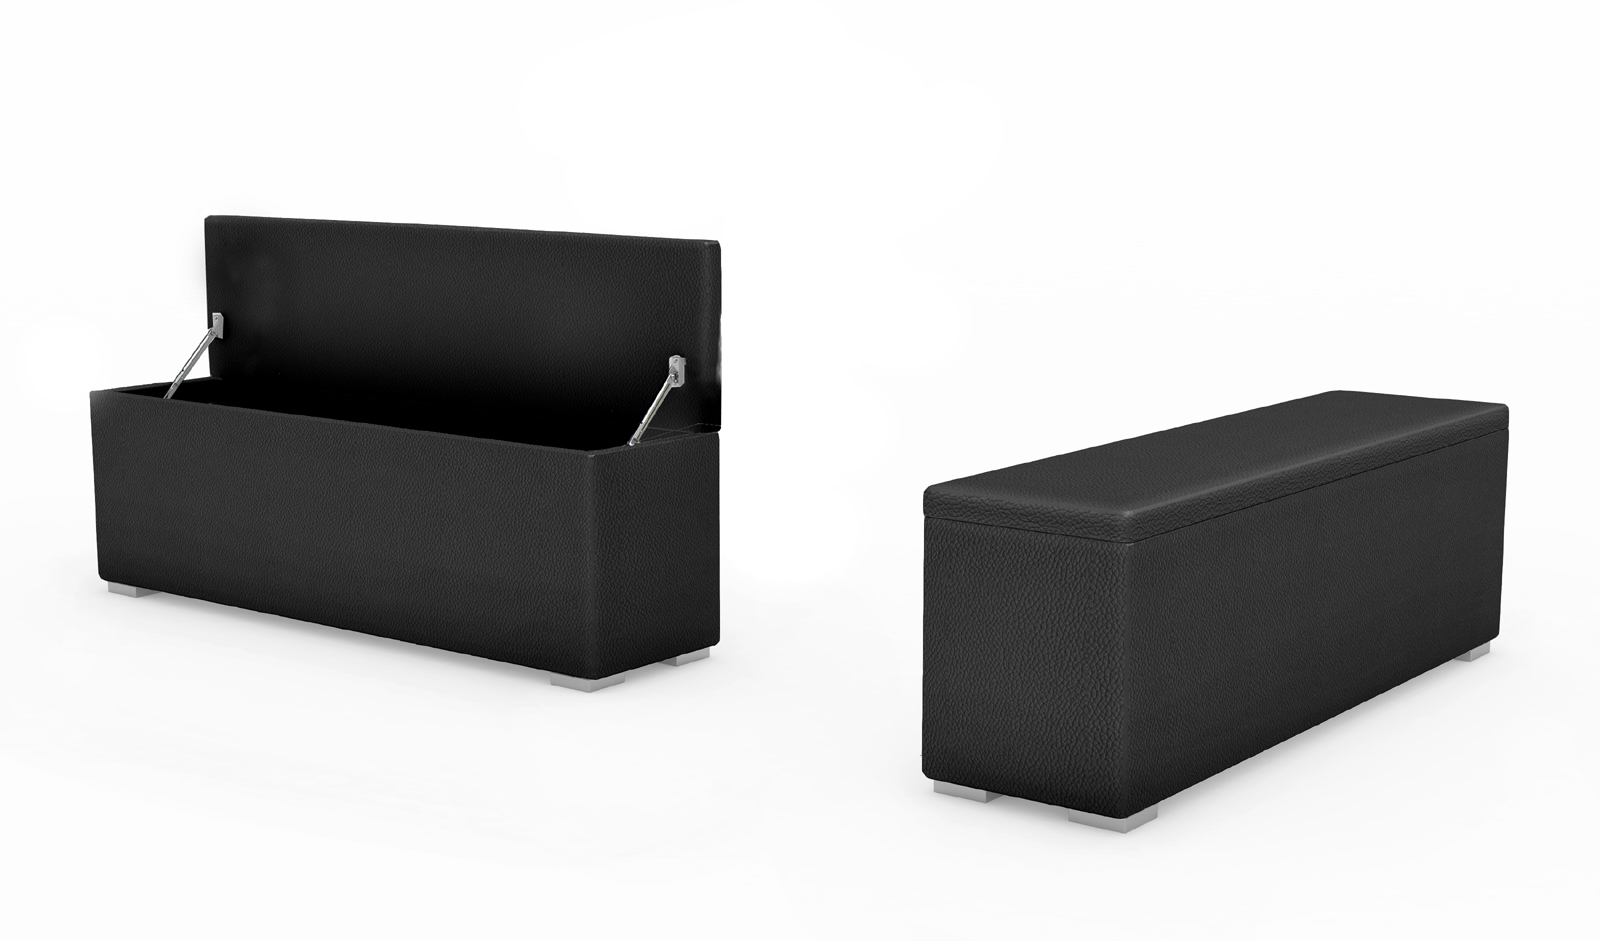 SAM® Bettbank Sitztruhe 120 x 38 cm aufklappbar schwarz HEIDI